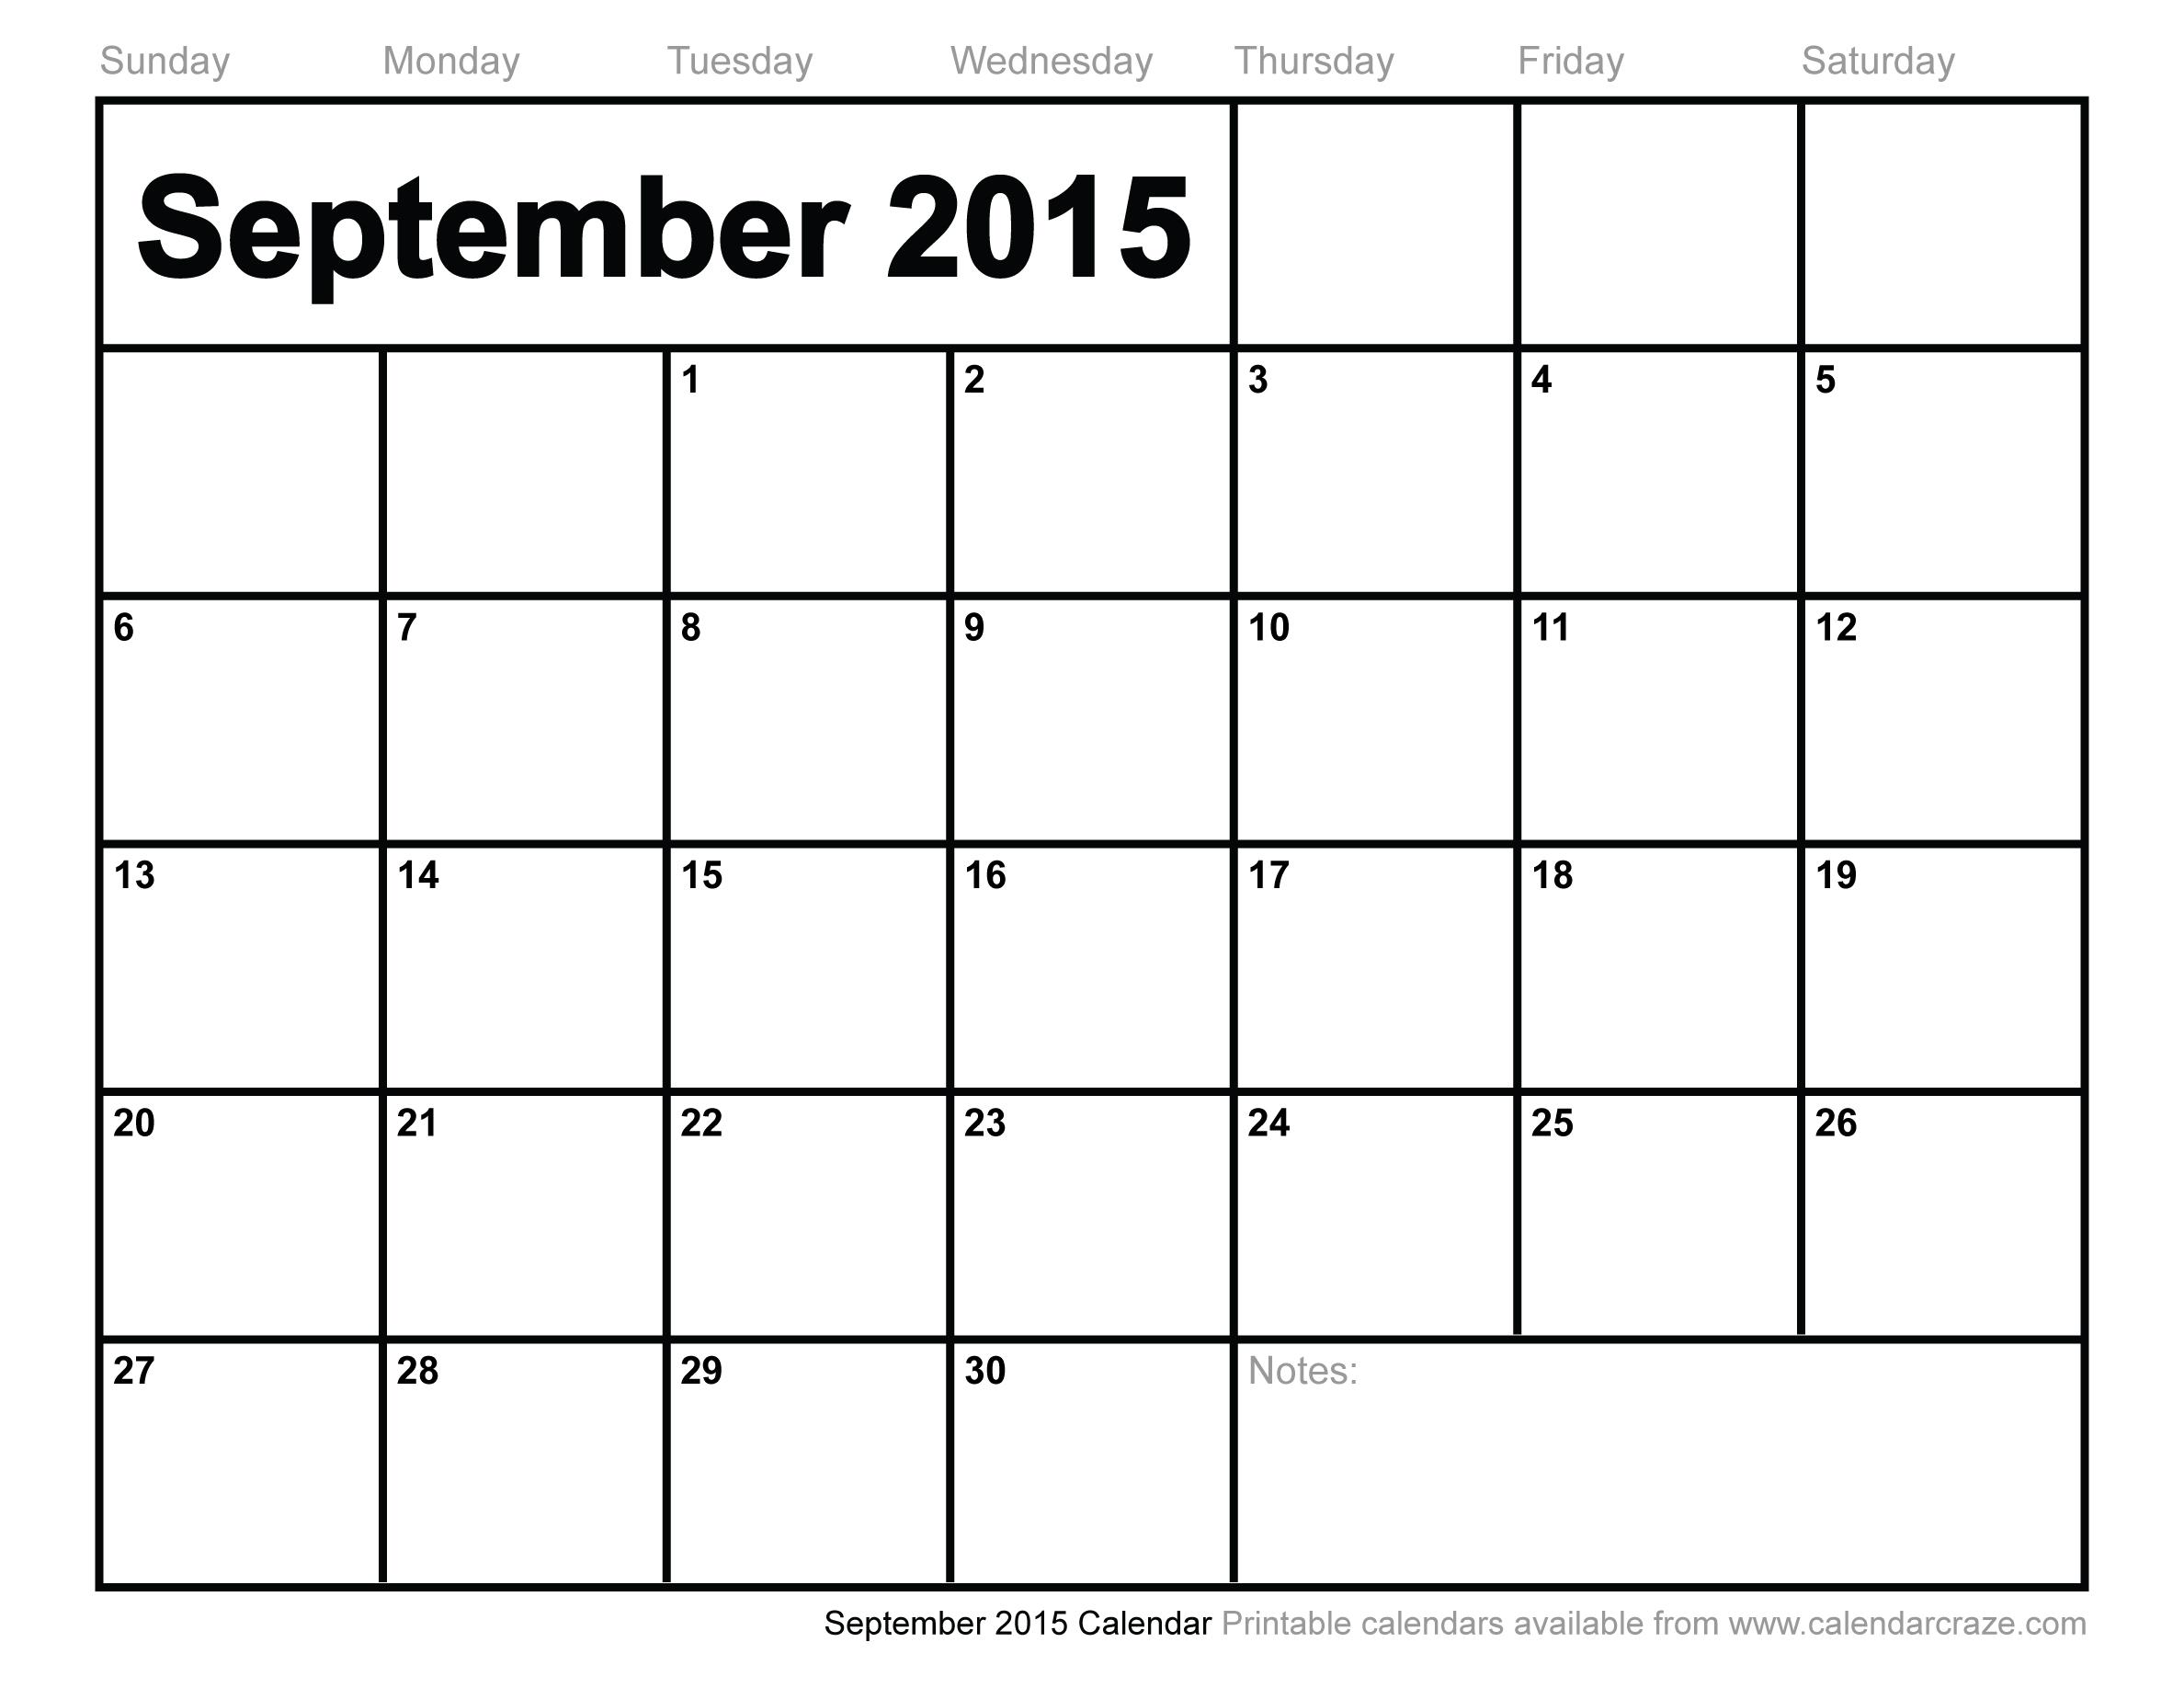 4 Images of 2015 Calendar Printable September